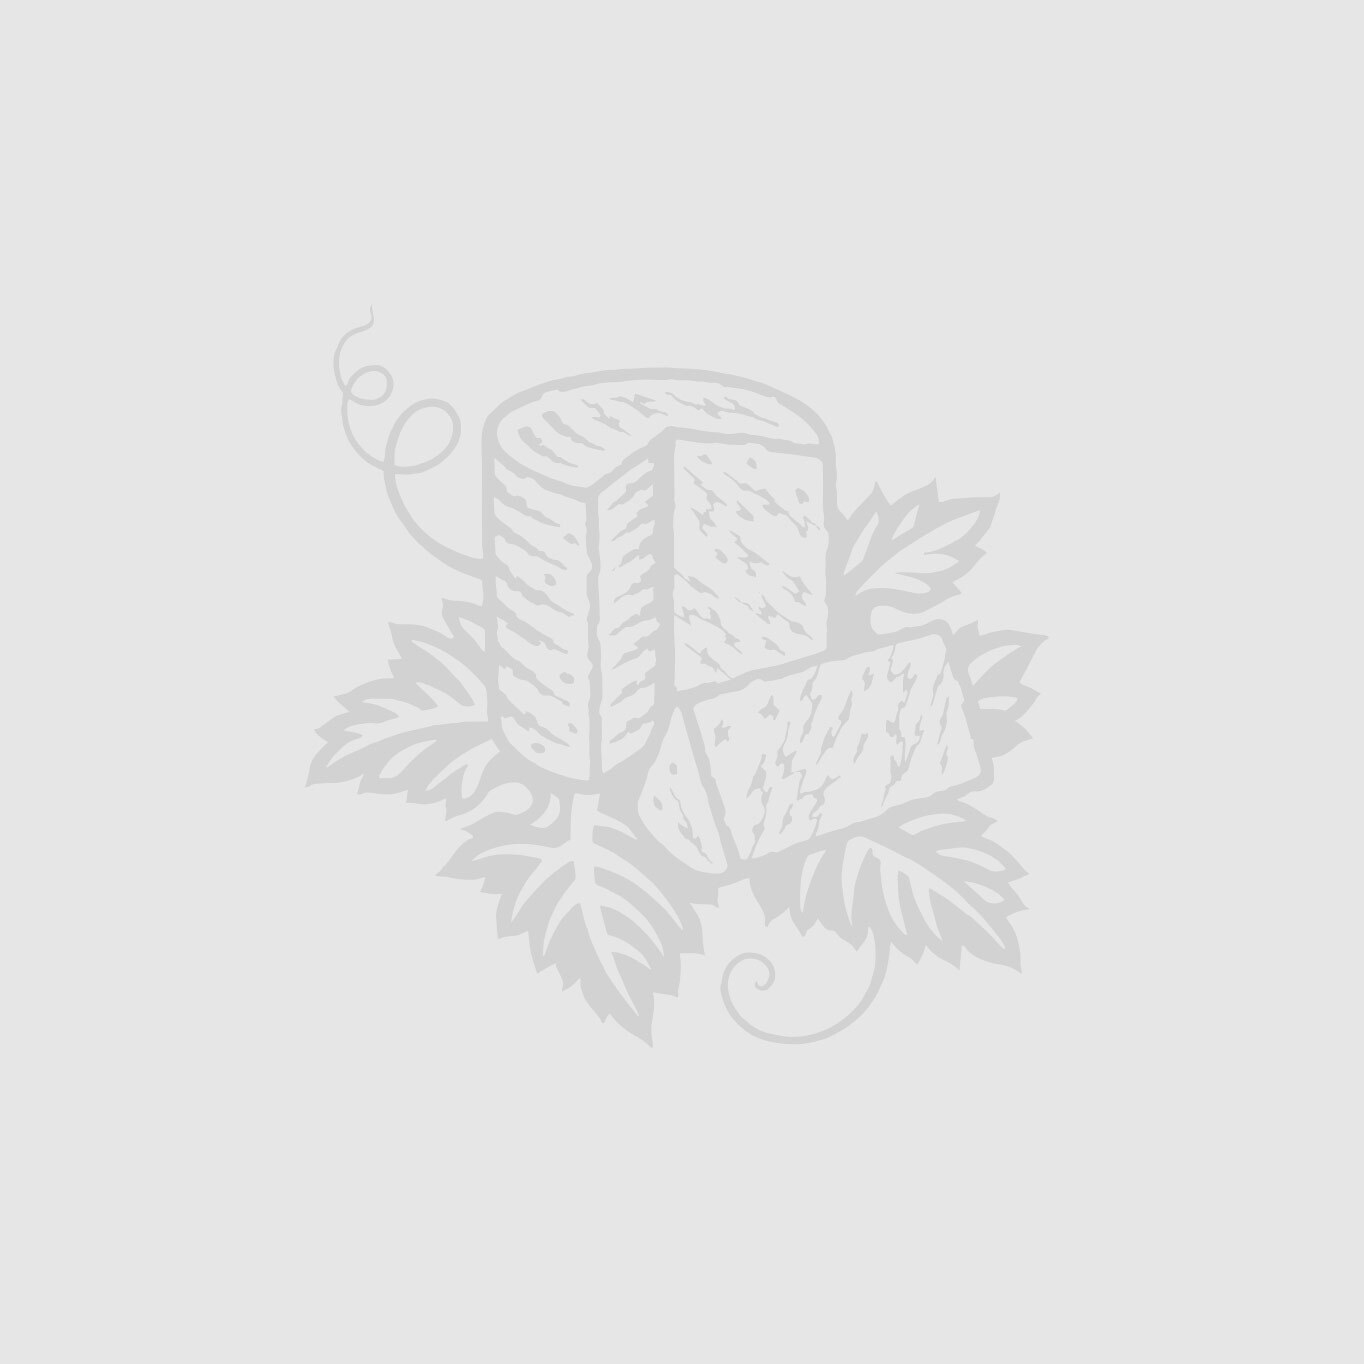 Sharpham Rustic - Natural